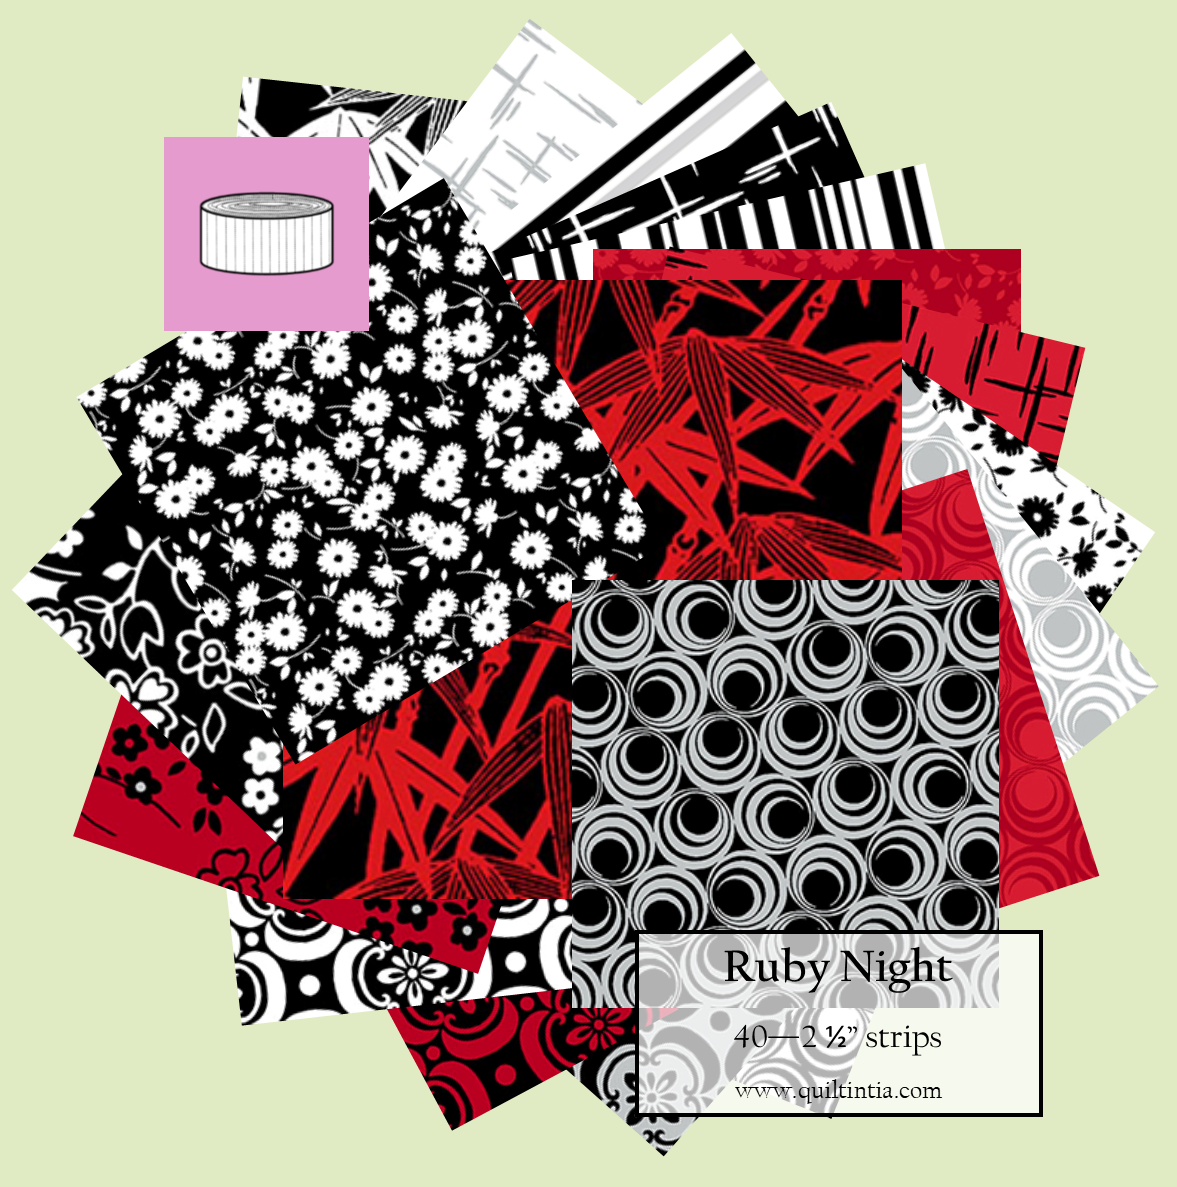 Ruby Night - 2 1/2 strip roll (40 strips)